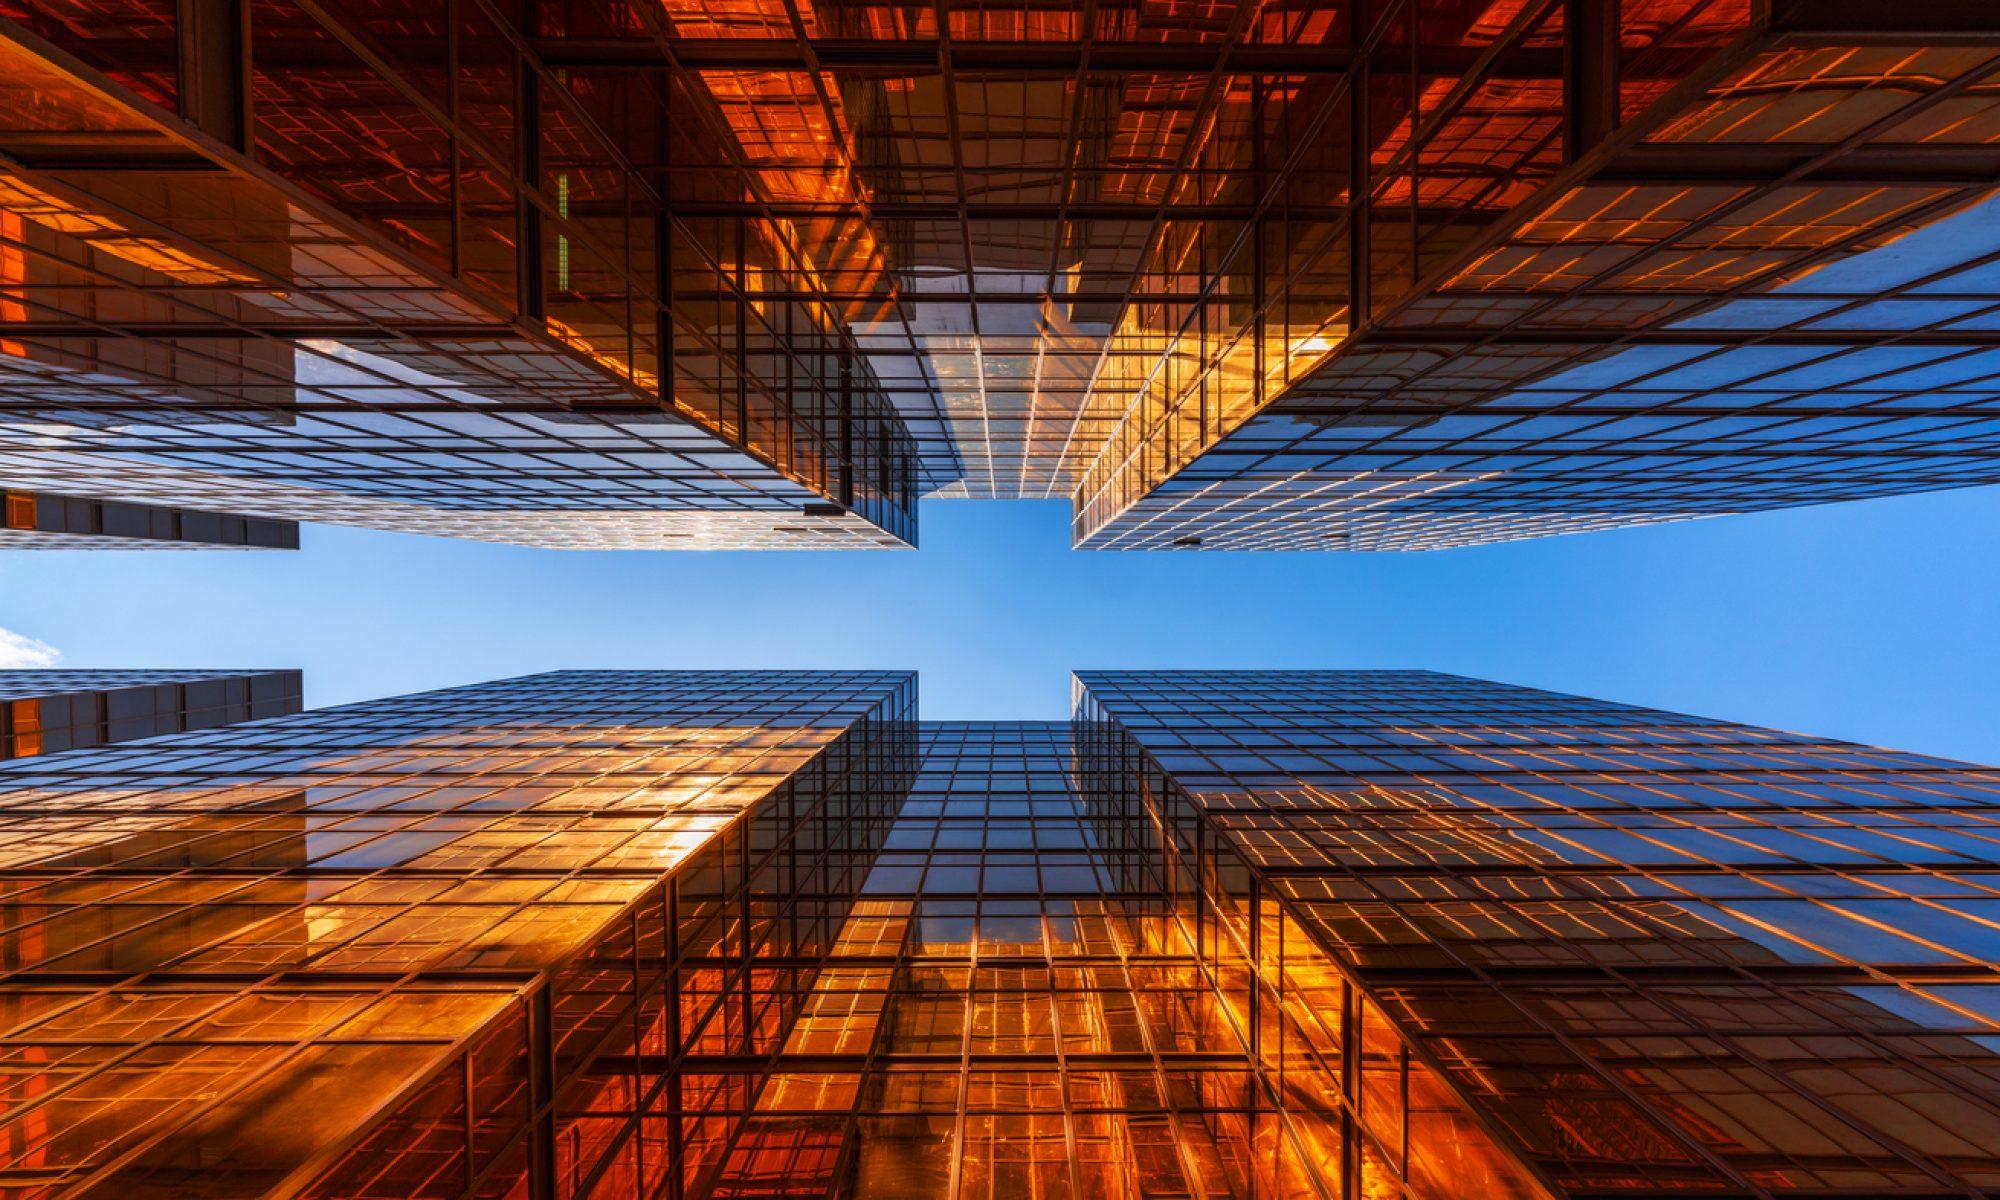 Tourre-architecte.com